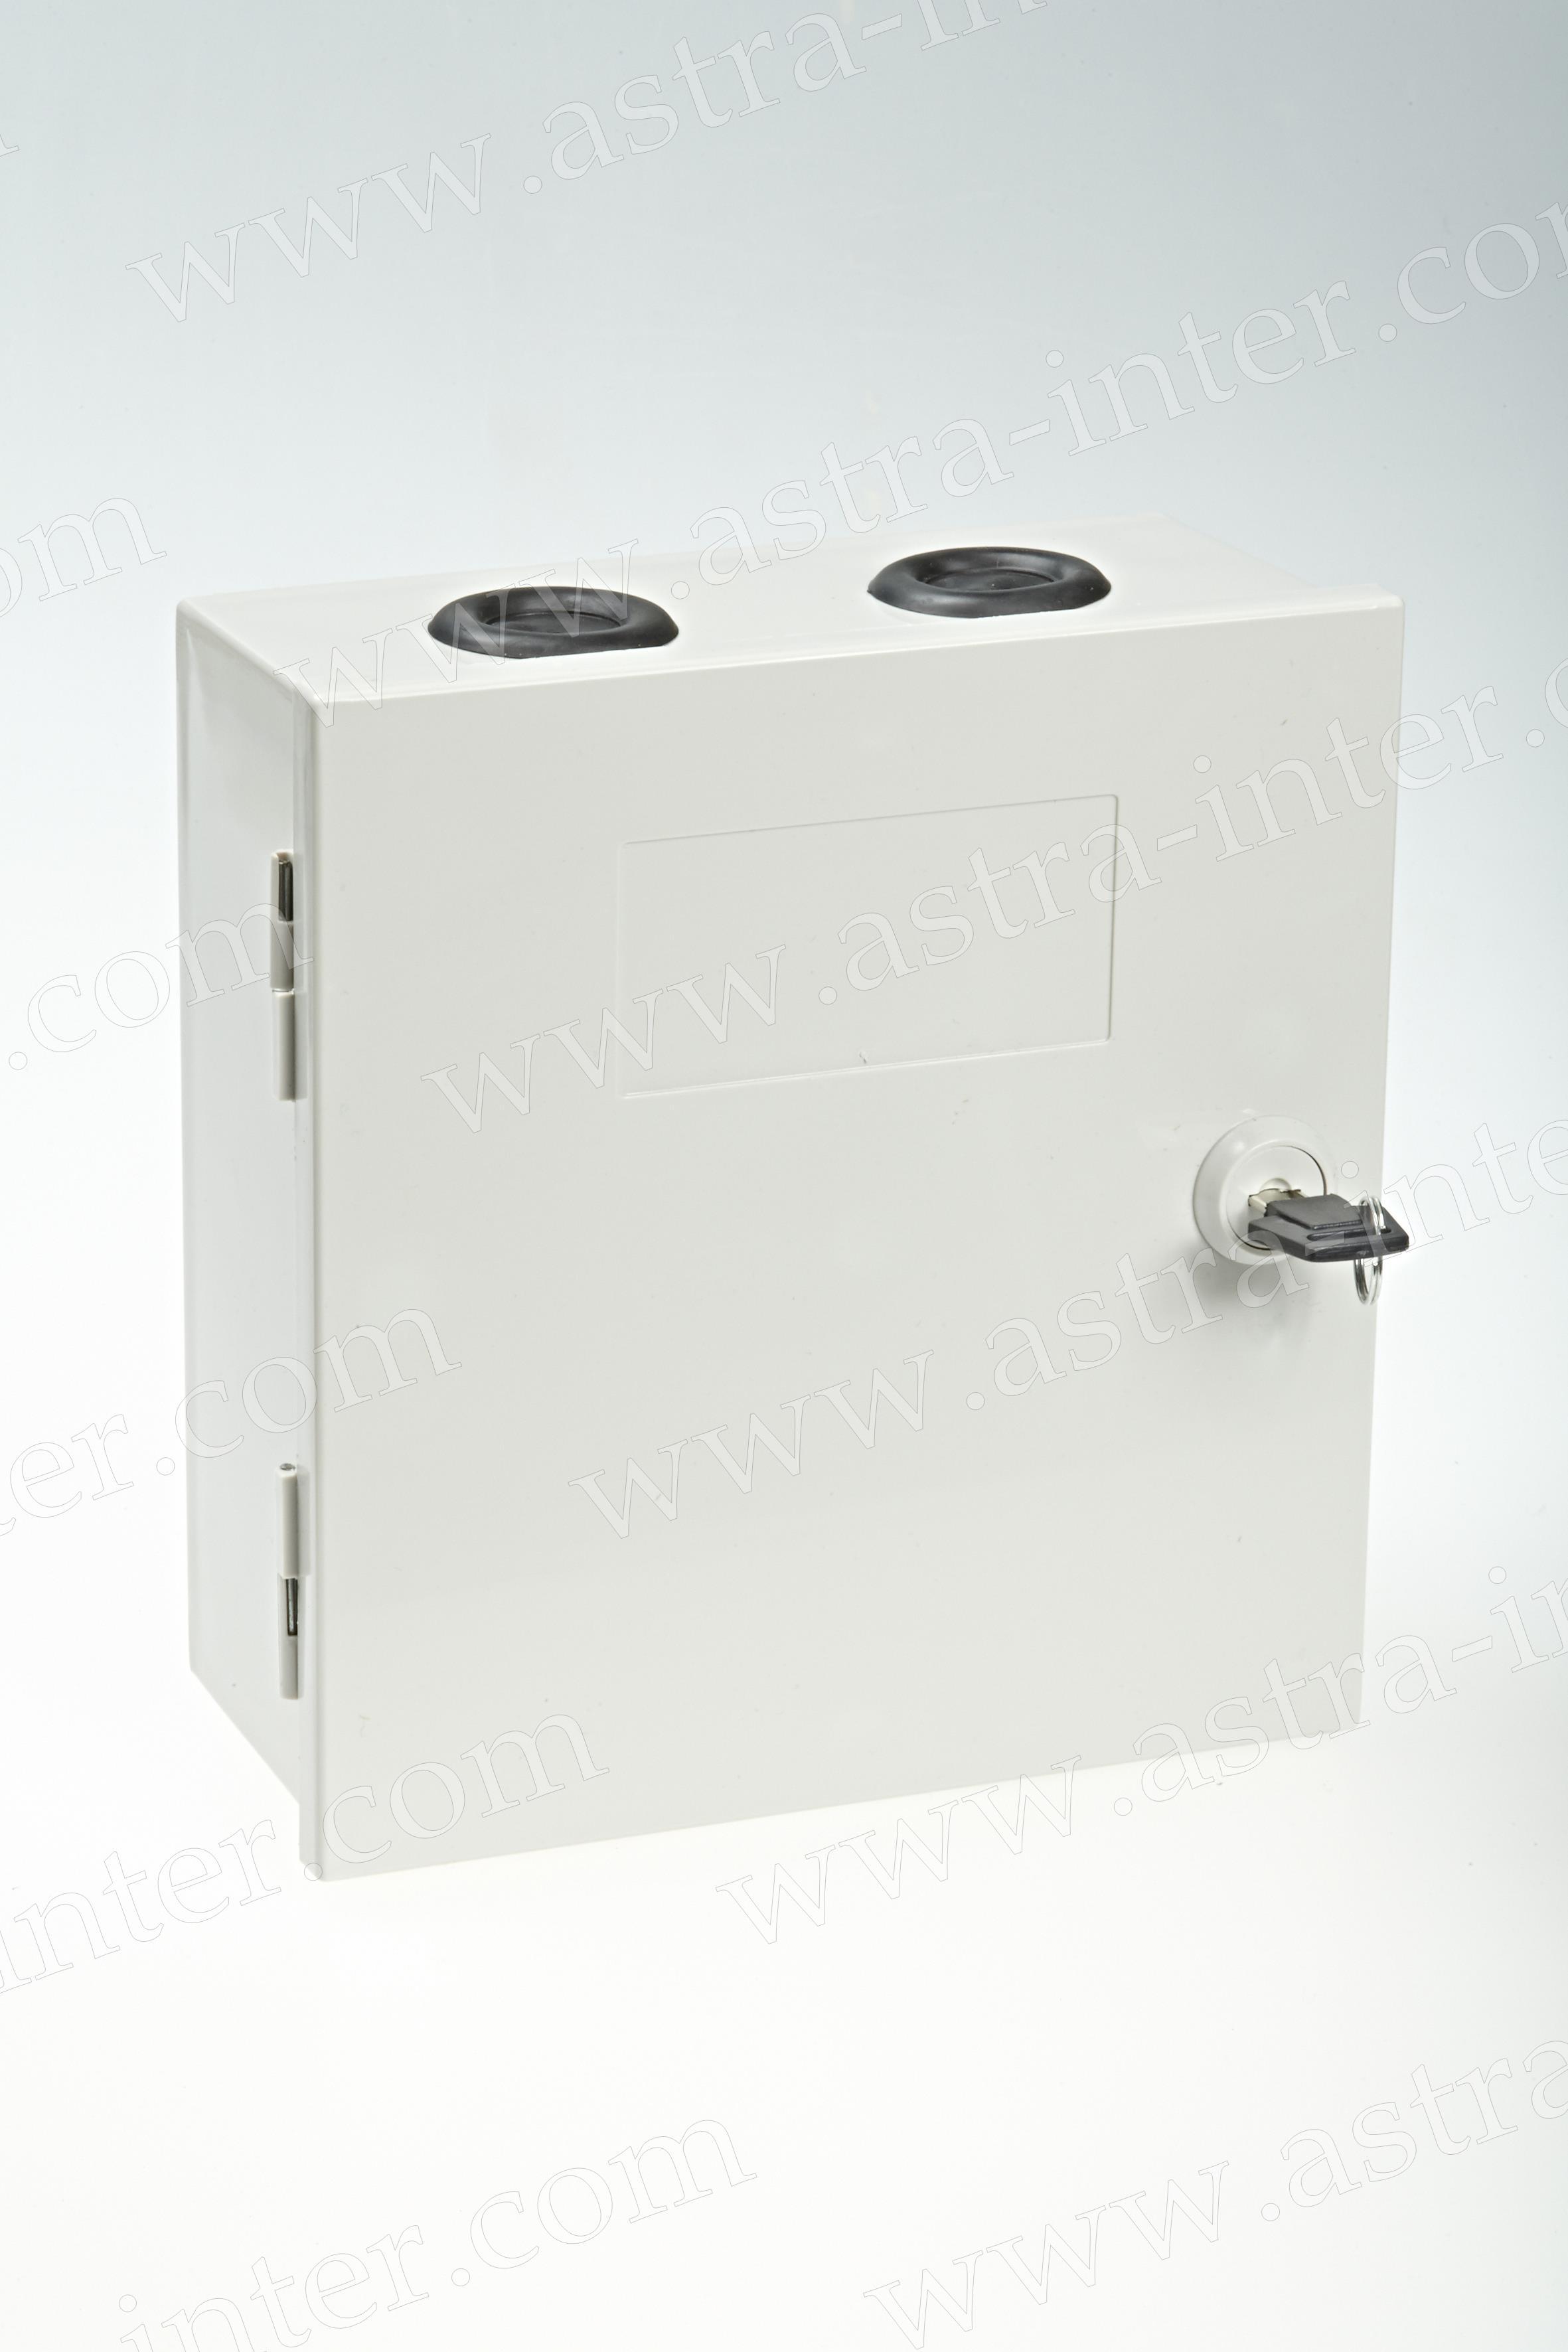 6. Коробка распределительная под установку 30 плинтов типа KRONE. Пластик.